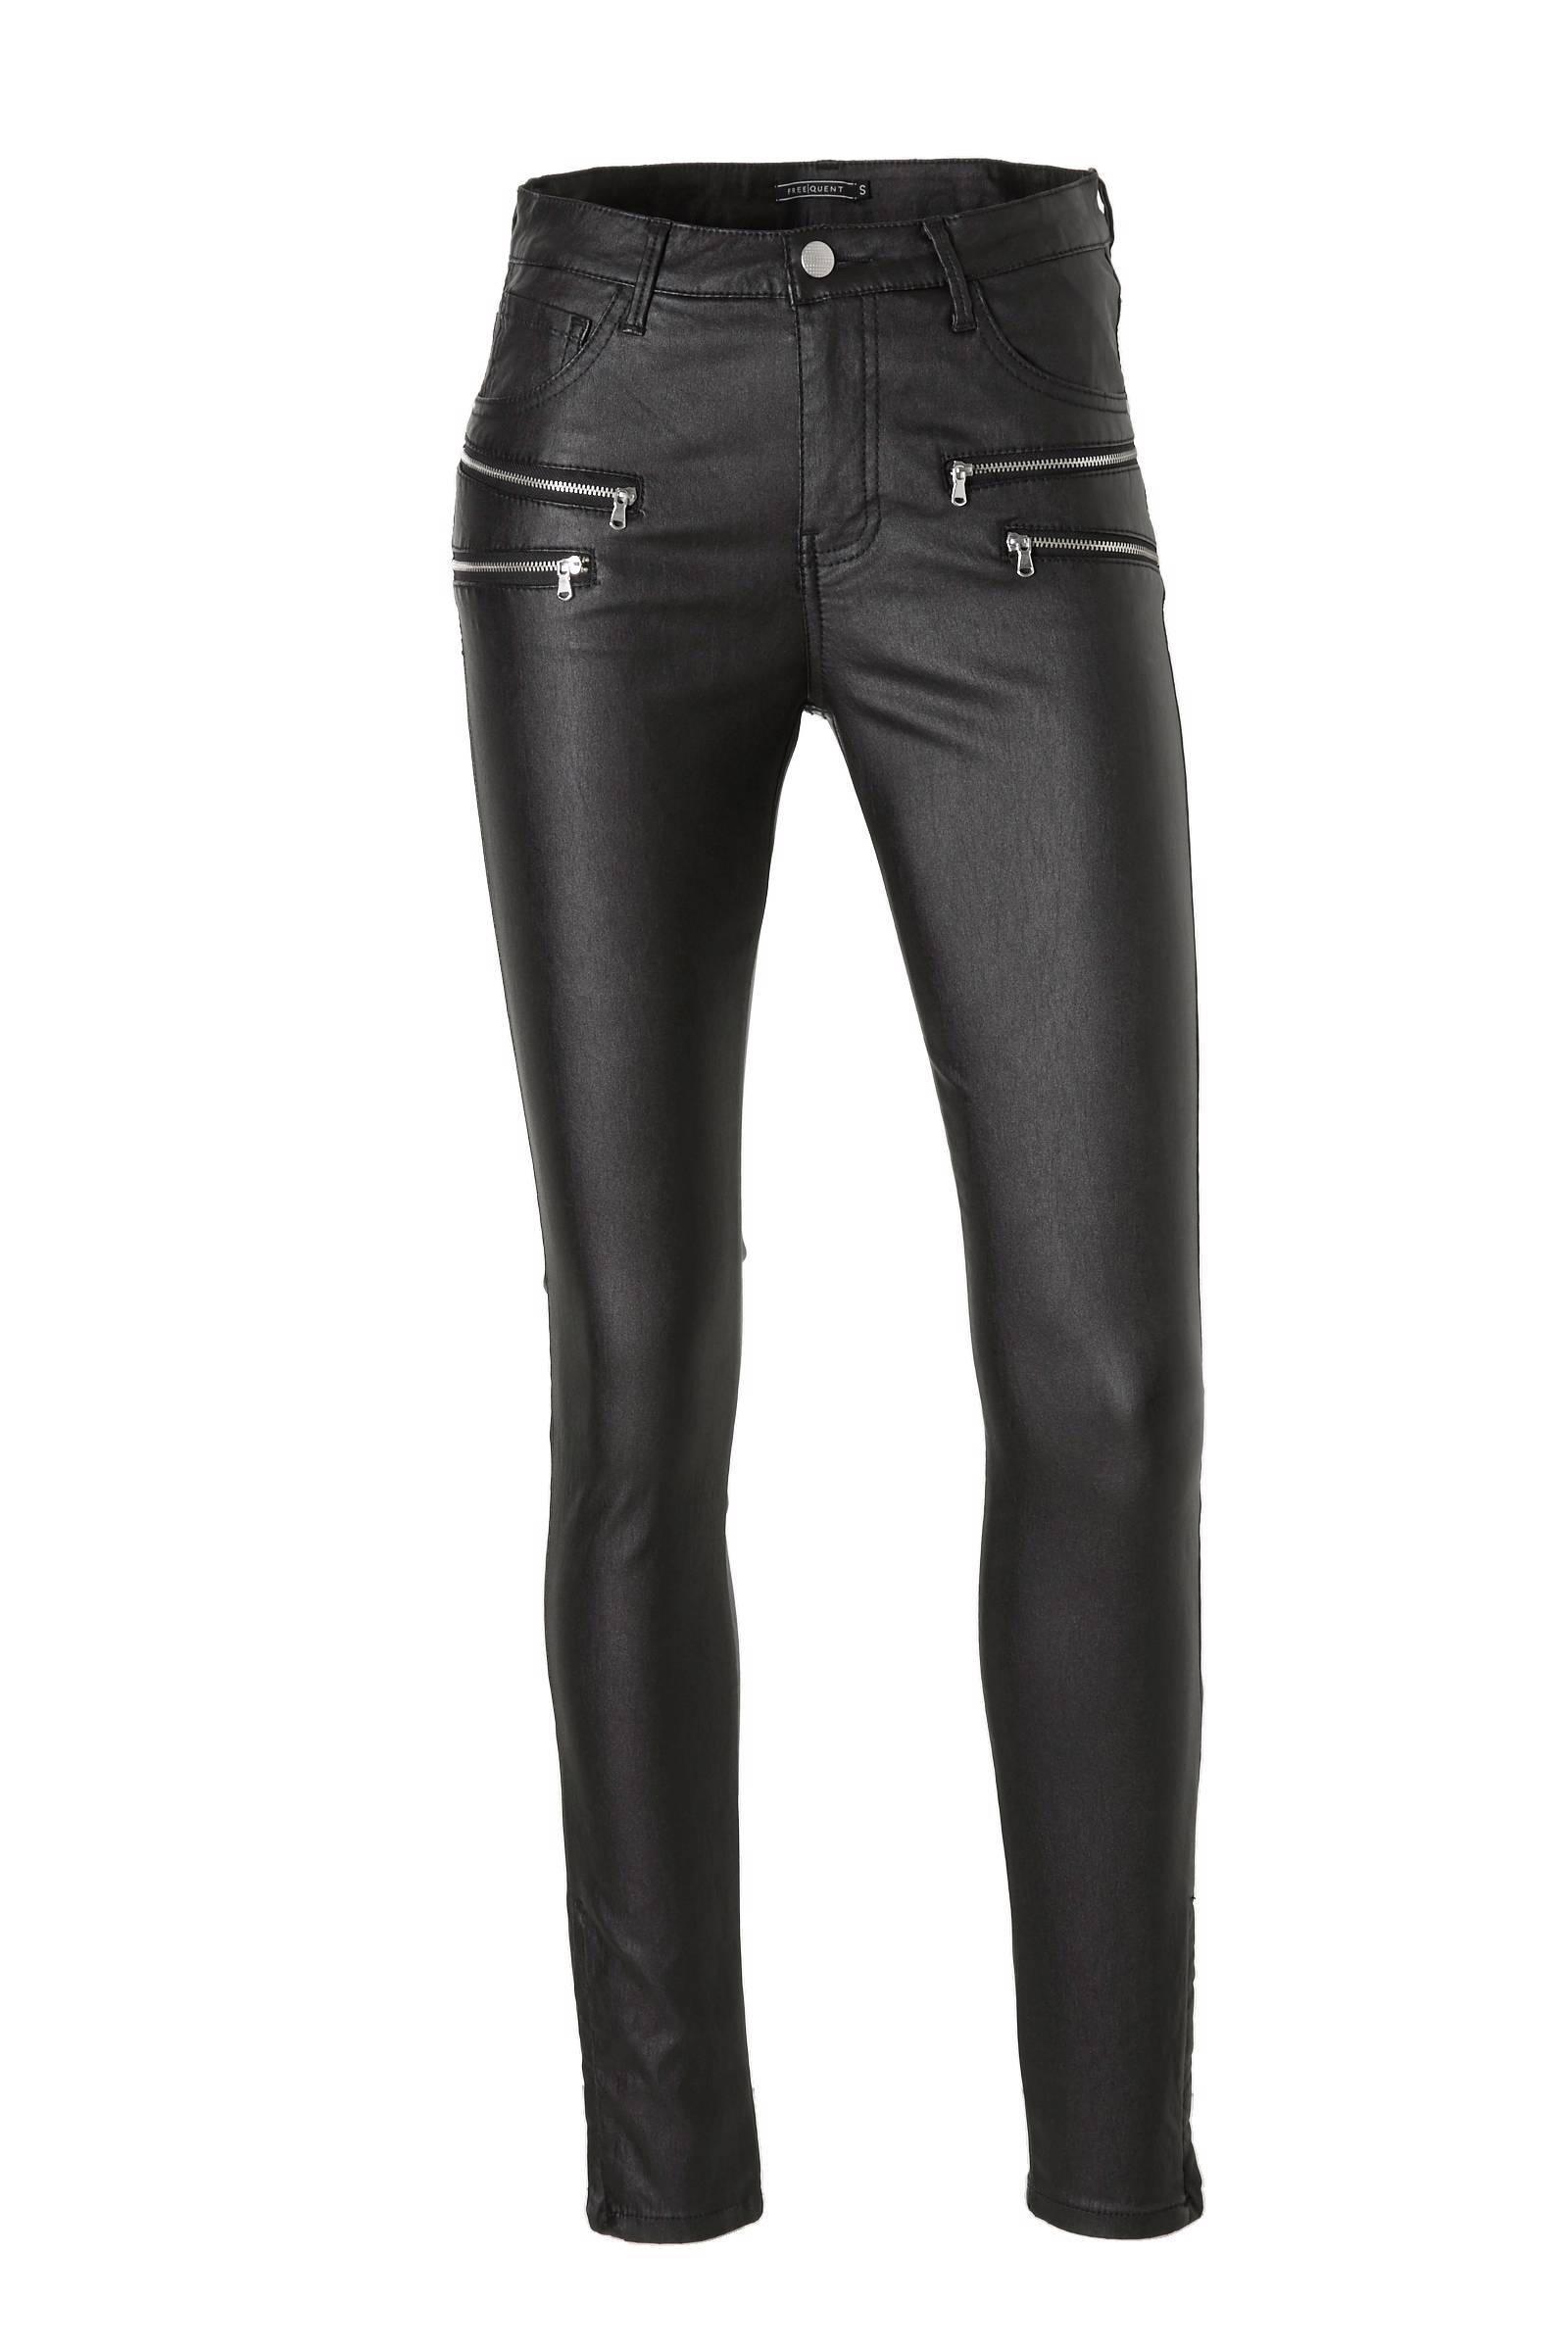 FREEQUENT 78 skinny fit coated broek wehkamp    FREEQUENT 78 skinny fit gecoate broek   title=  f70a7299370ce867c5dd2f4a82c1f4c2     wehkamp